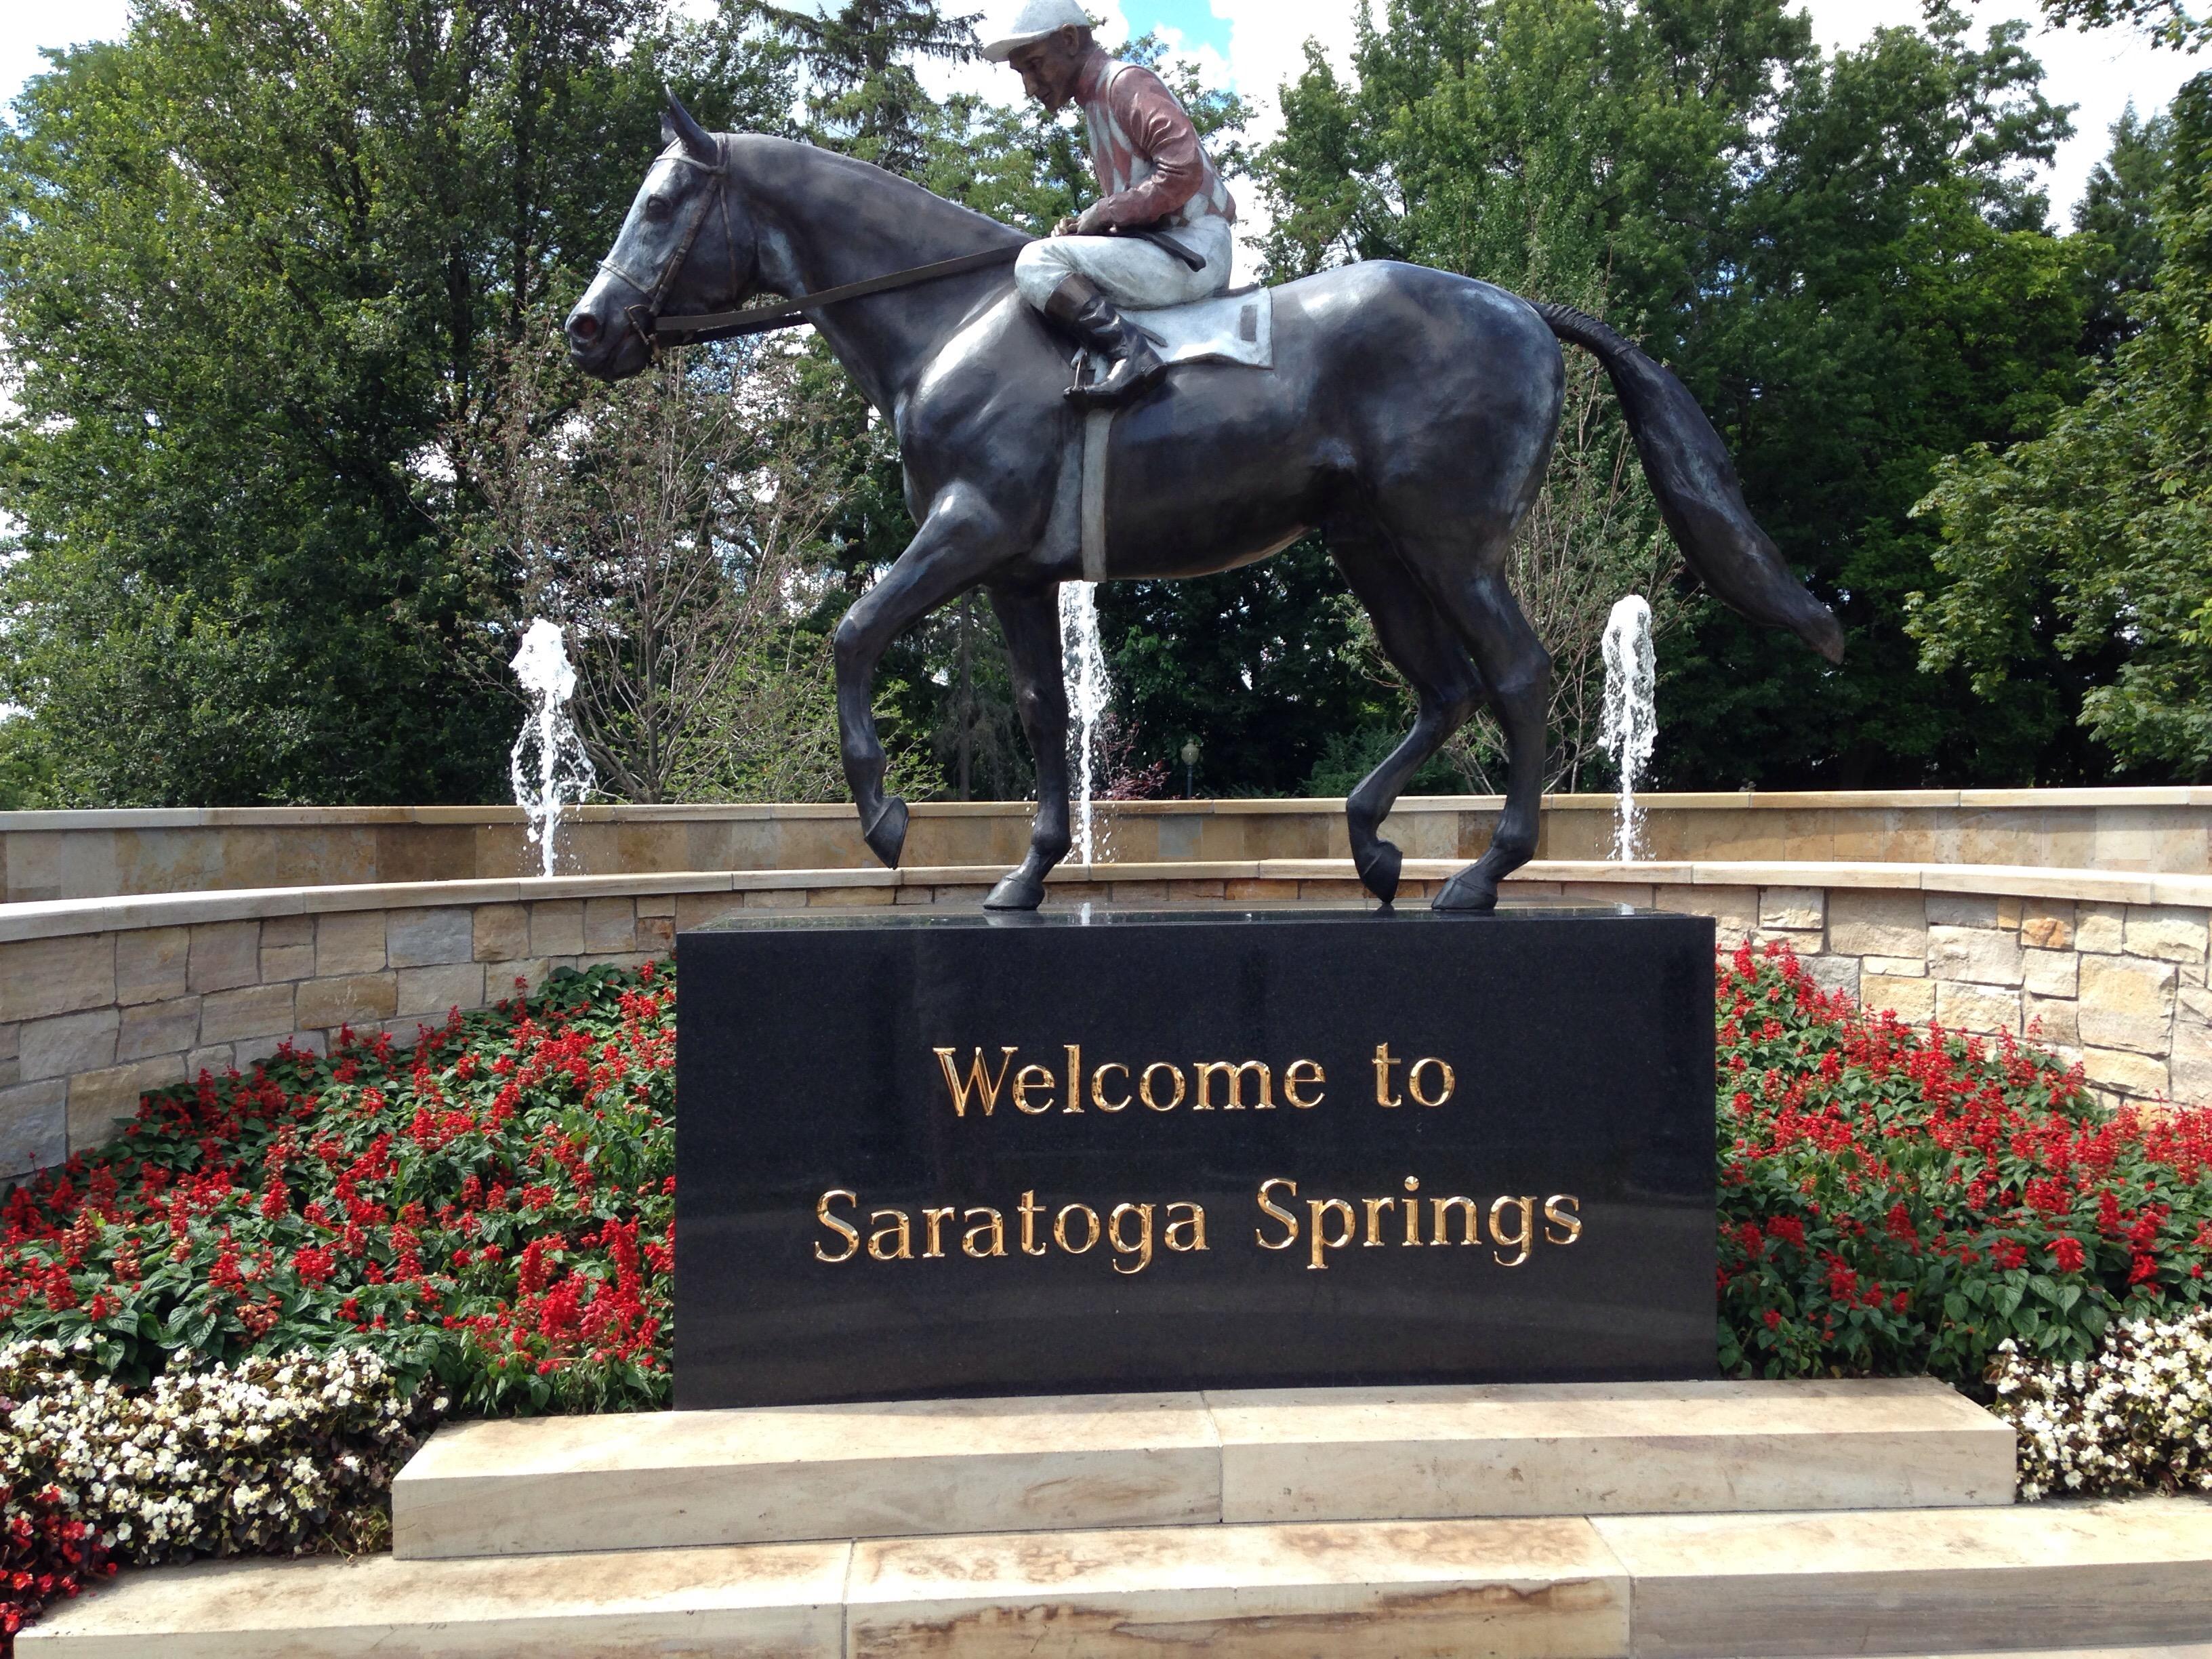 6361310412698126051225807044_Native_Dancer_statue_Saratoga_Springs_NY